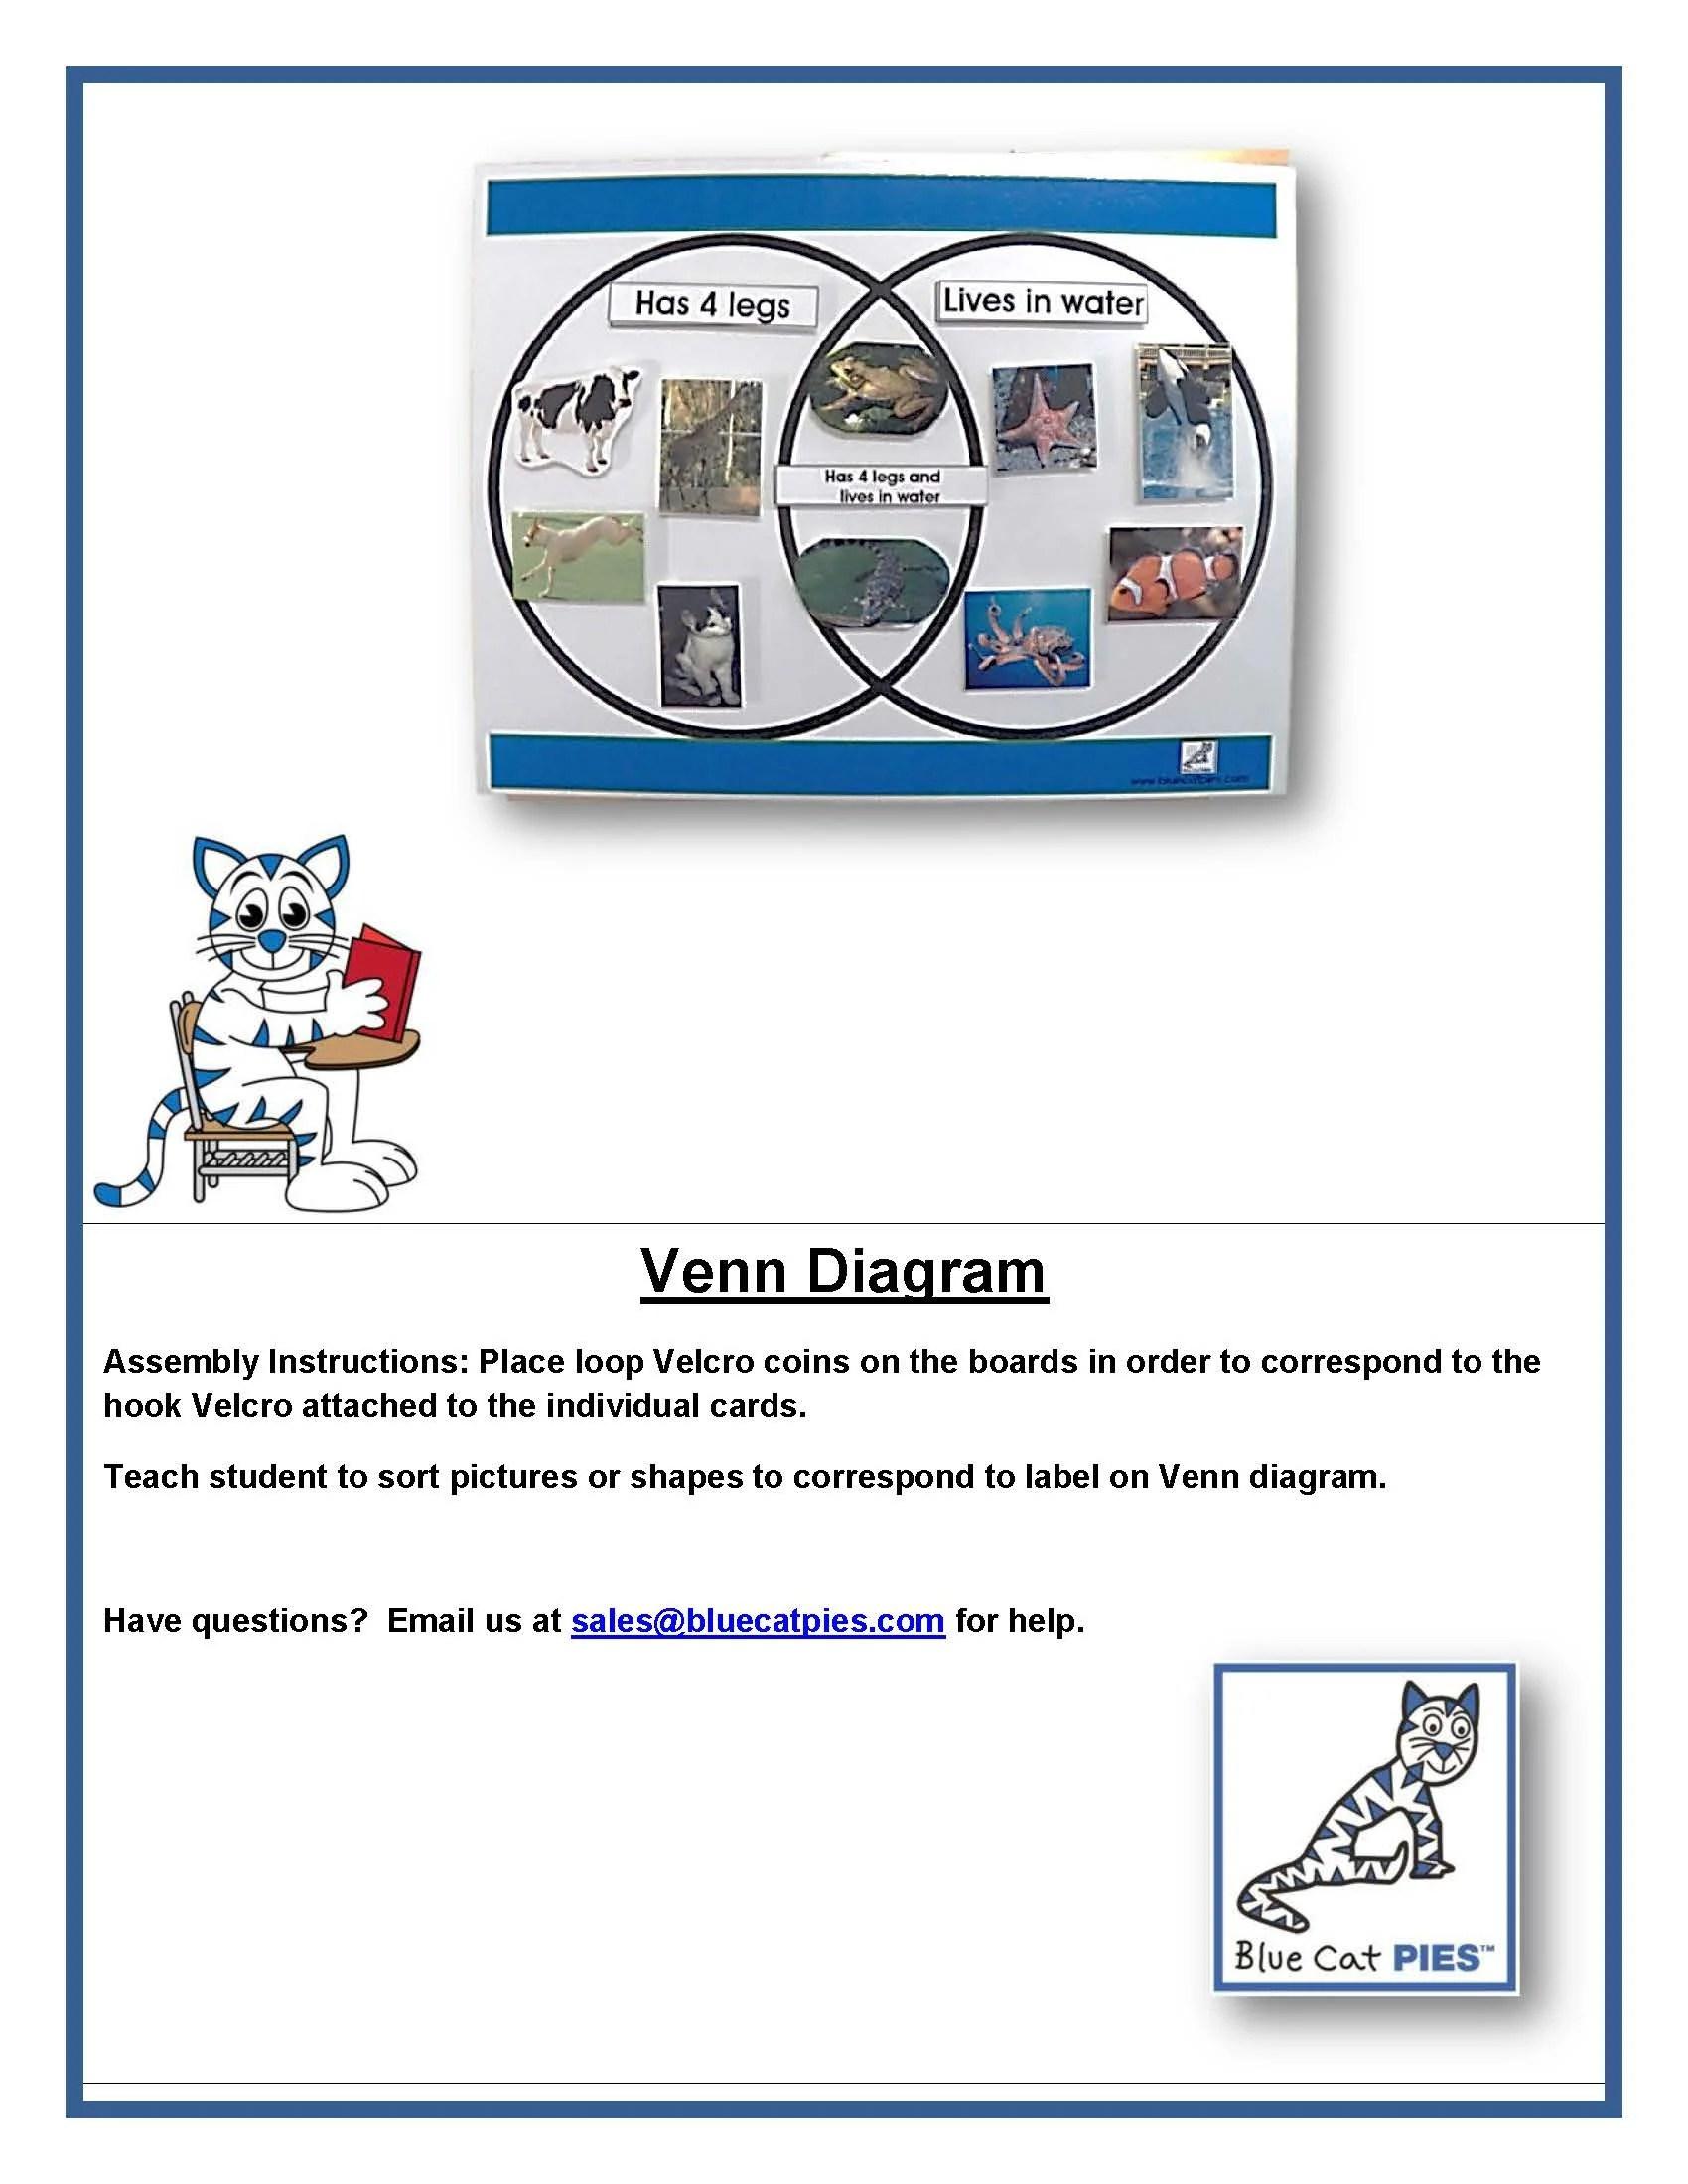 venn diagram in teaching [ 1700 x 2200 Pixel ]